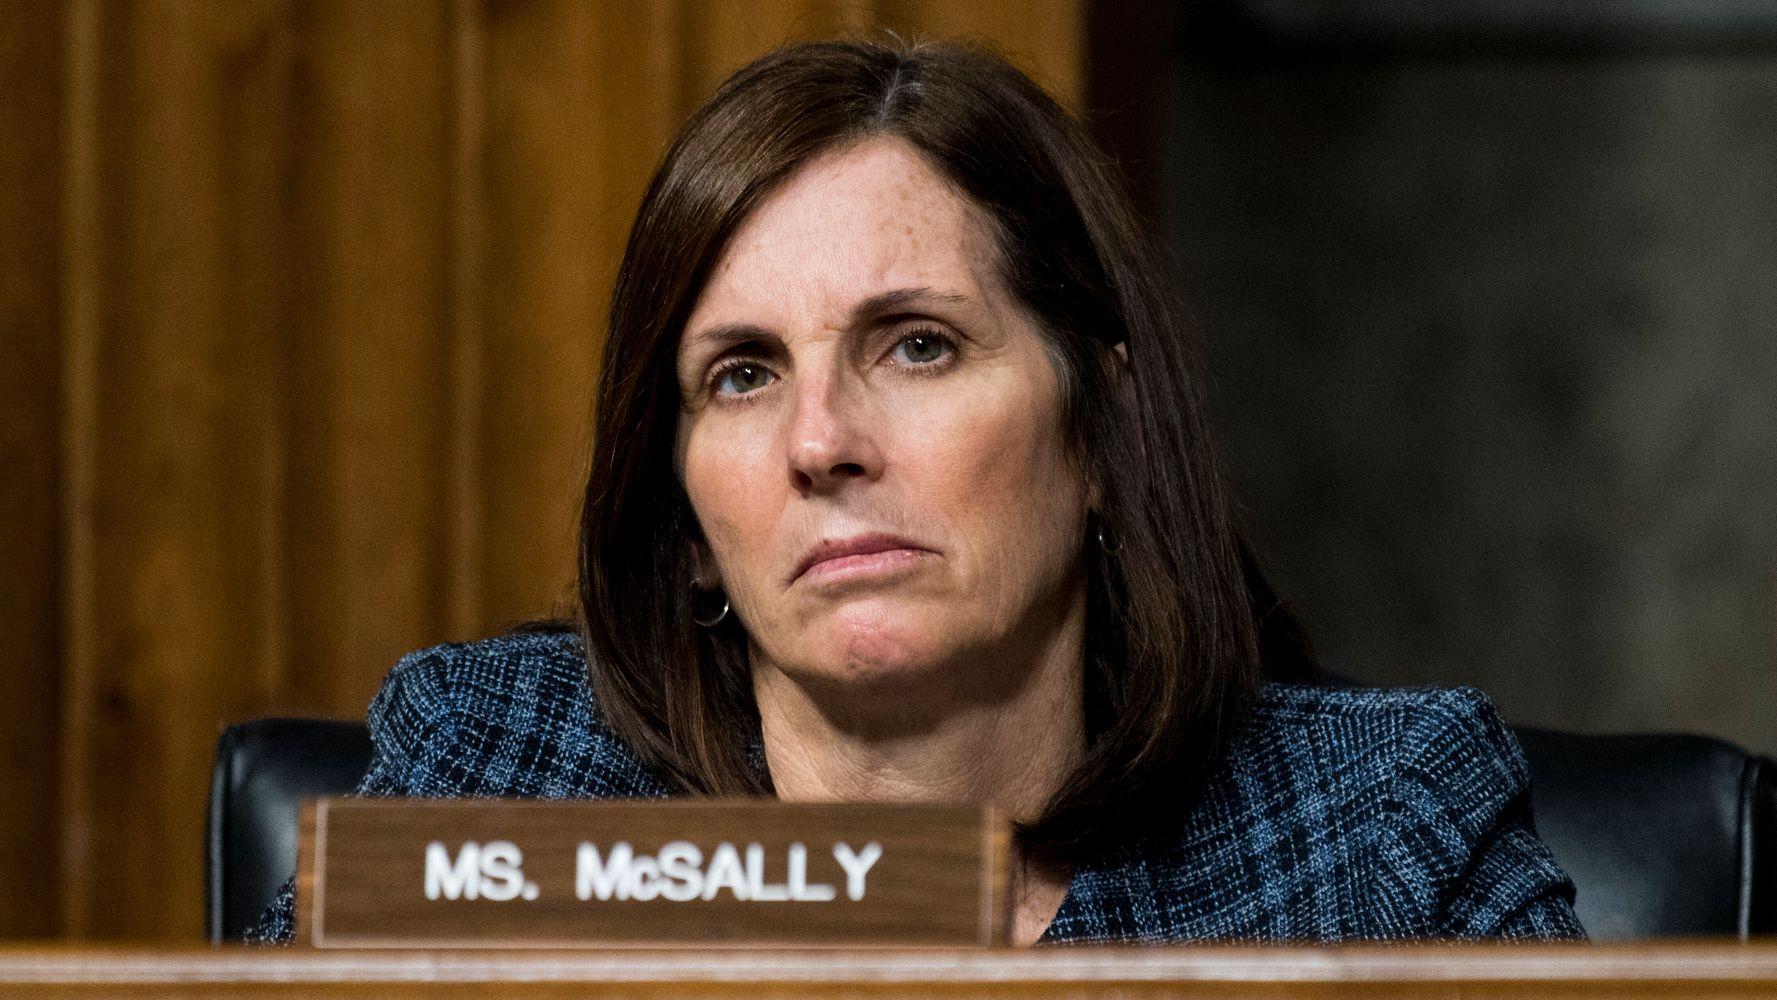 Westlake Legal Group 5e20ab1224000033006c426d GOP Senator Dodges Impeachment Questions, Calls Reporter A 'Liberal Hack'